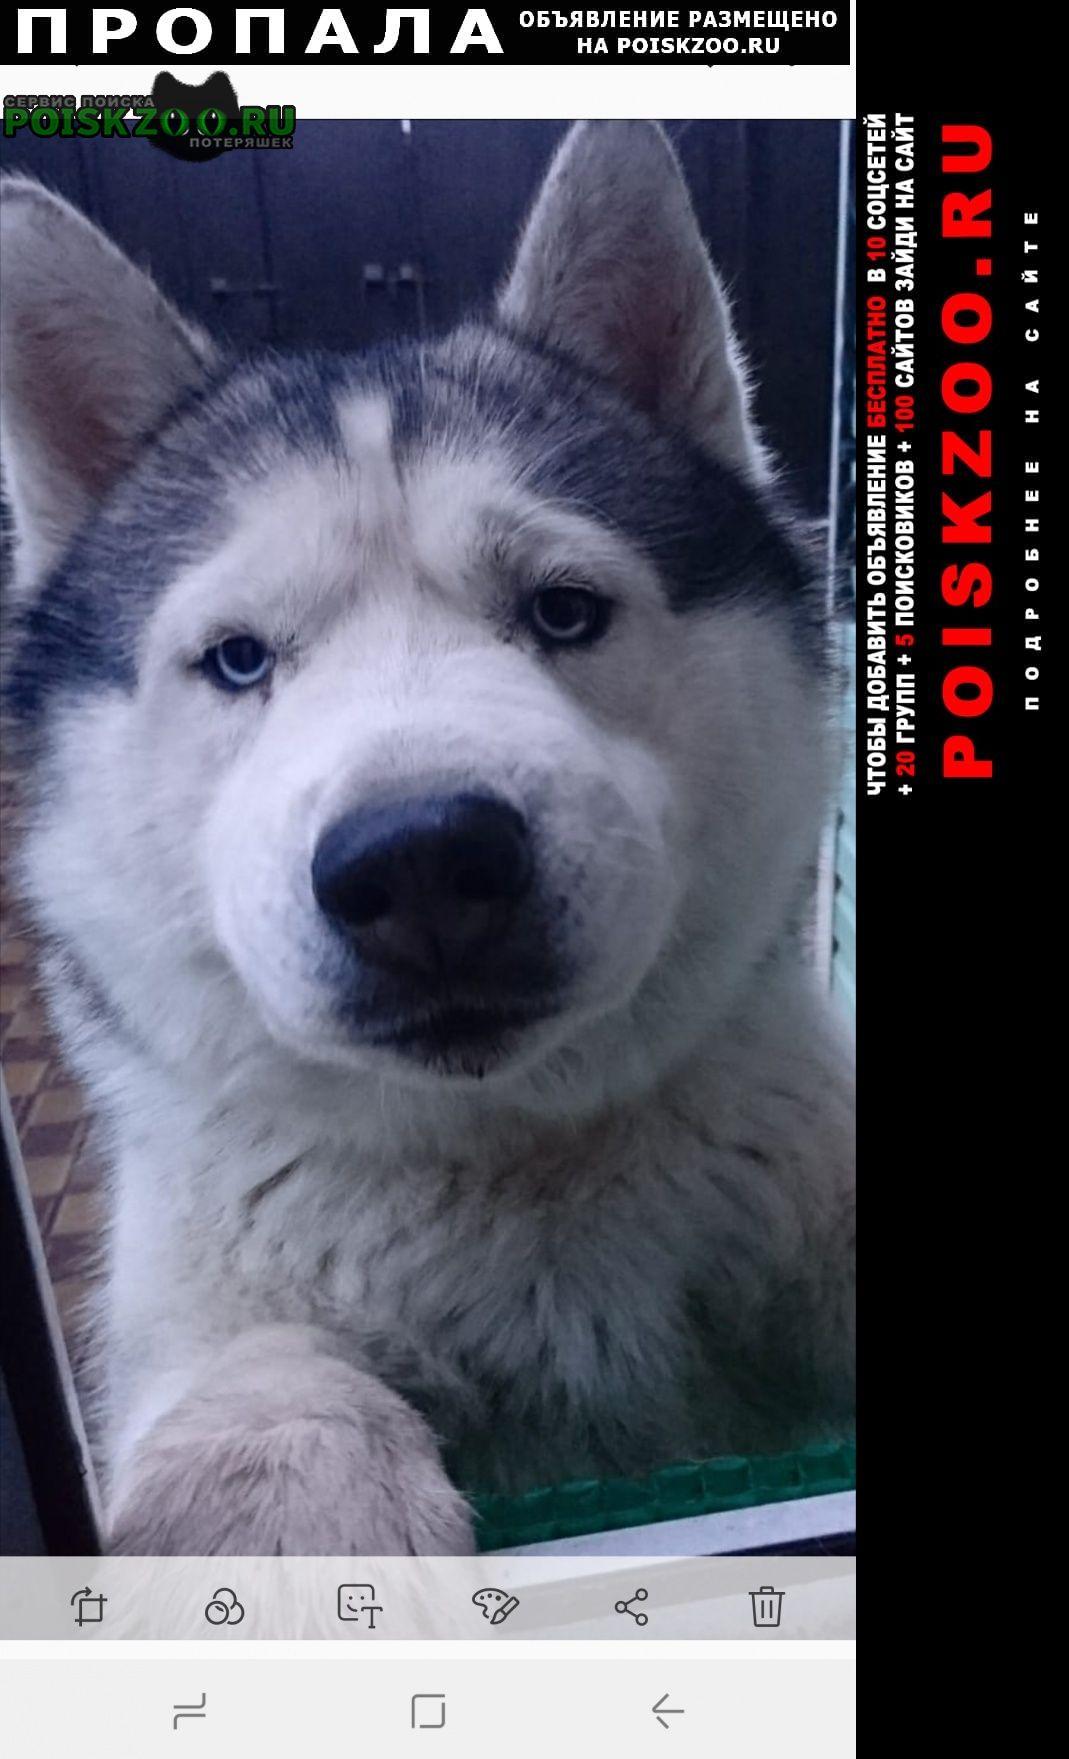 Пропала собака кобель кабель маламут патрик 3 года Туапсе